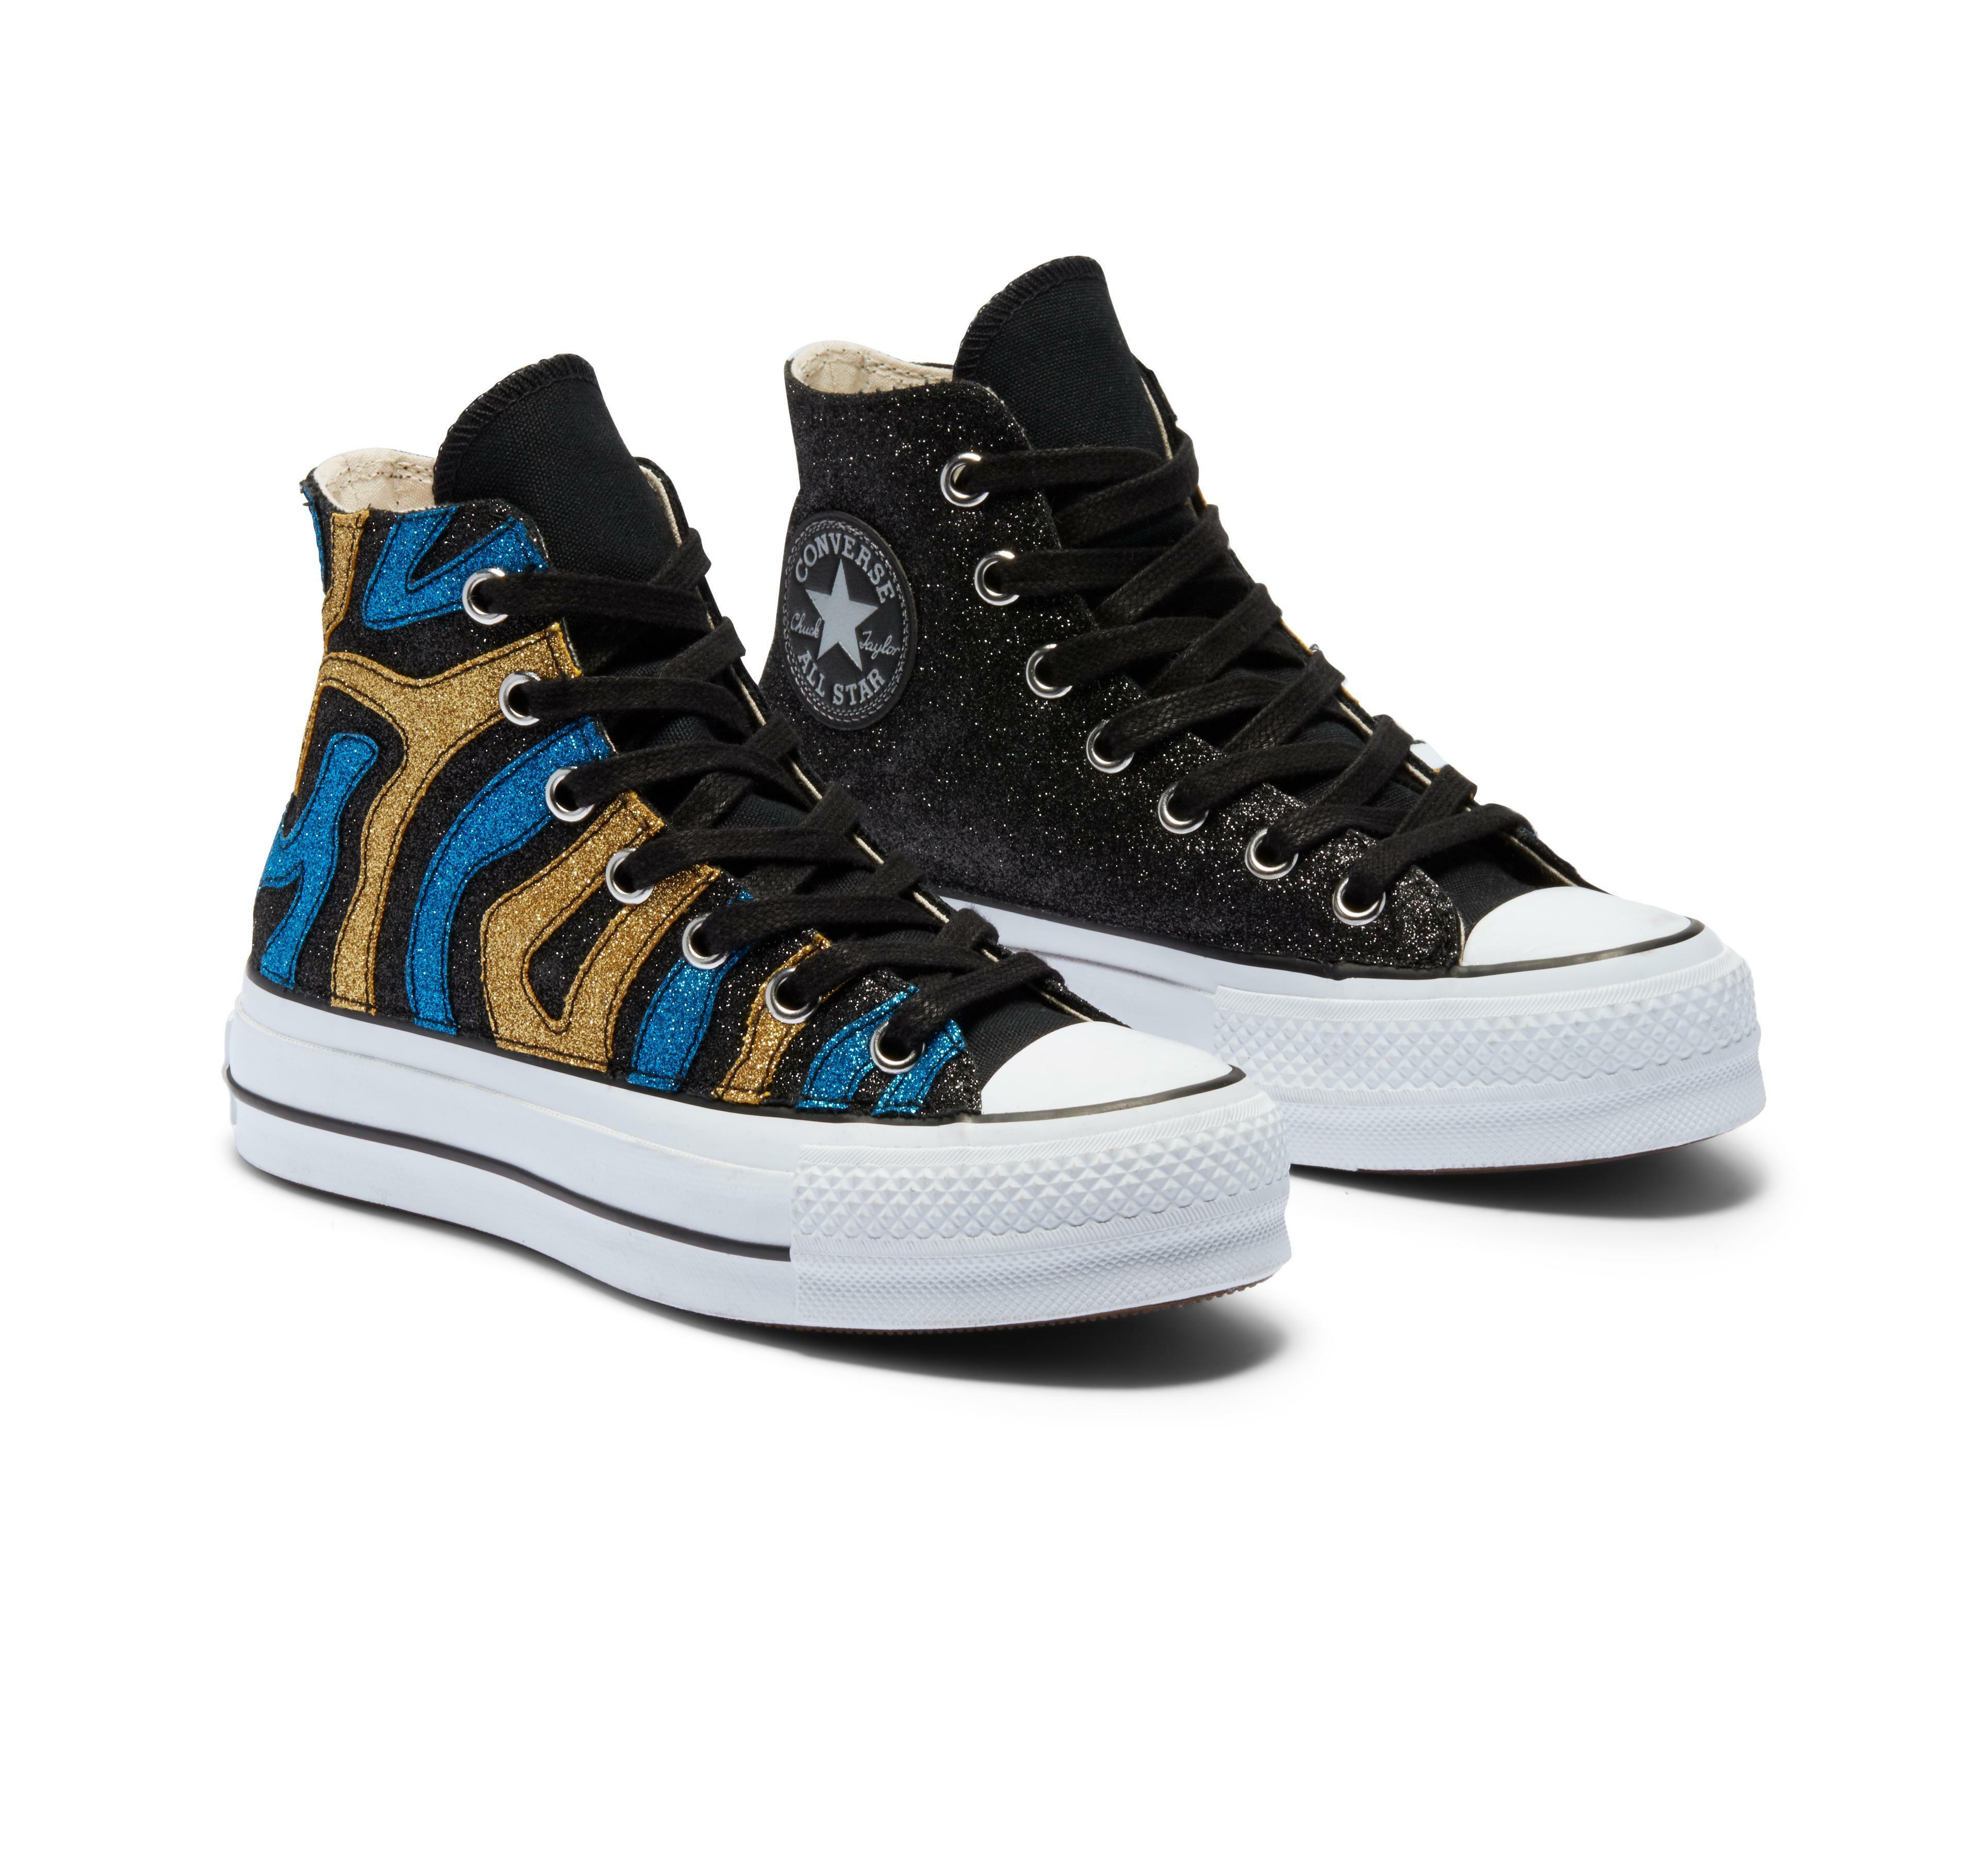 converse converse ctas lift hi limited edition 569131c  gold blue nero sneakers donna